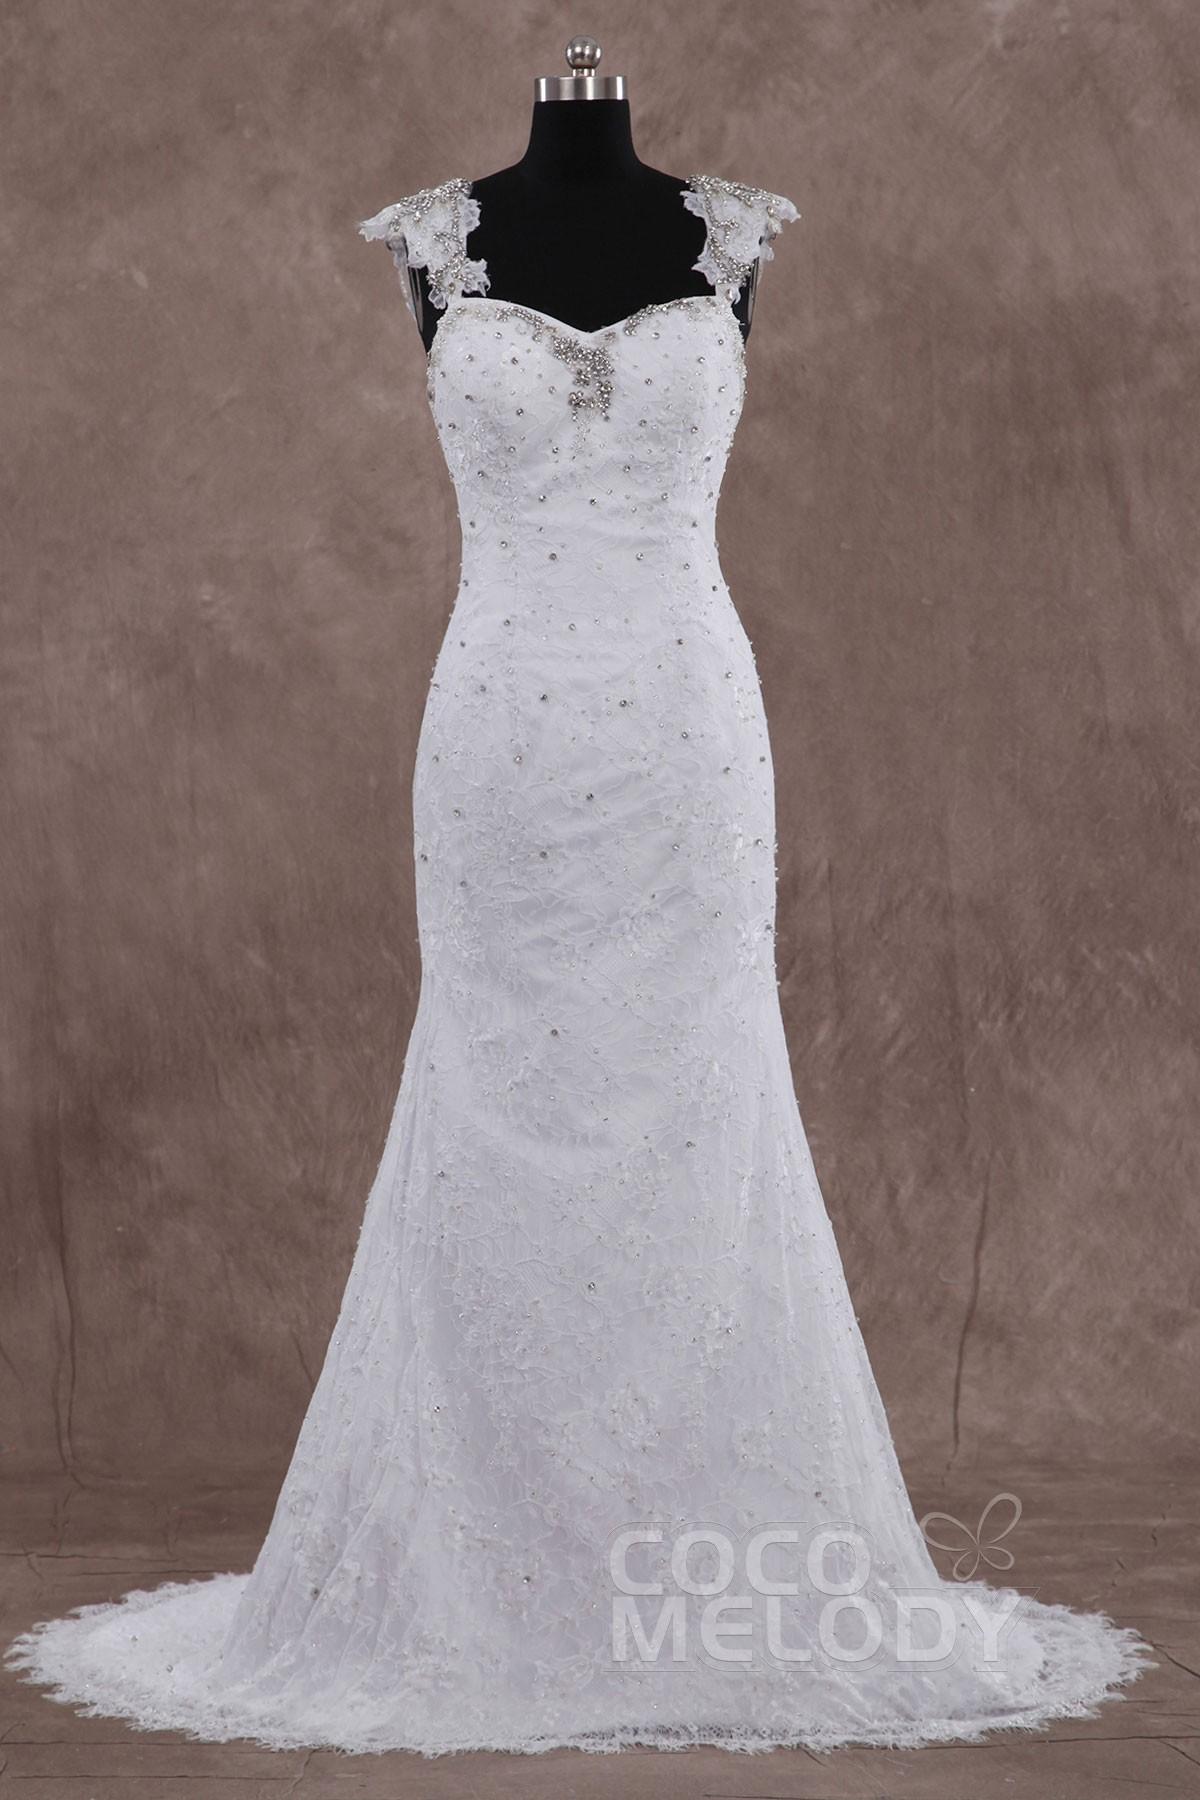 Sheath-Column Sweep-Brush Train Lace Wedding Dress LD3335 | Cocomelody